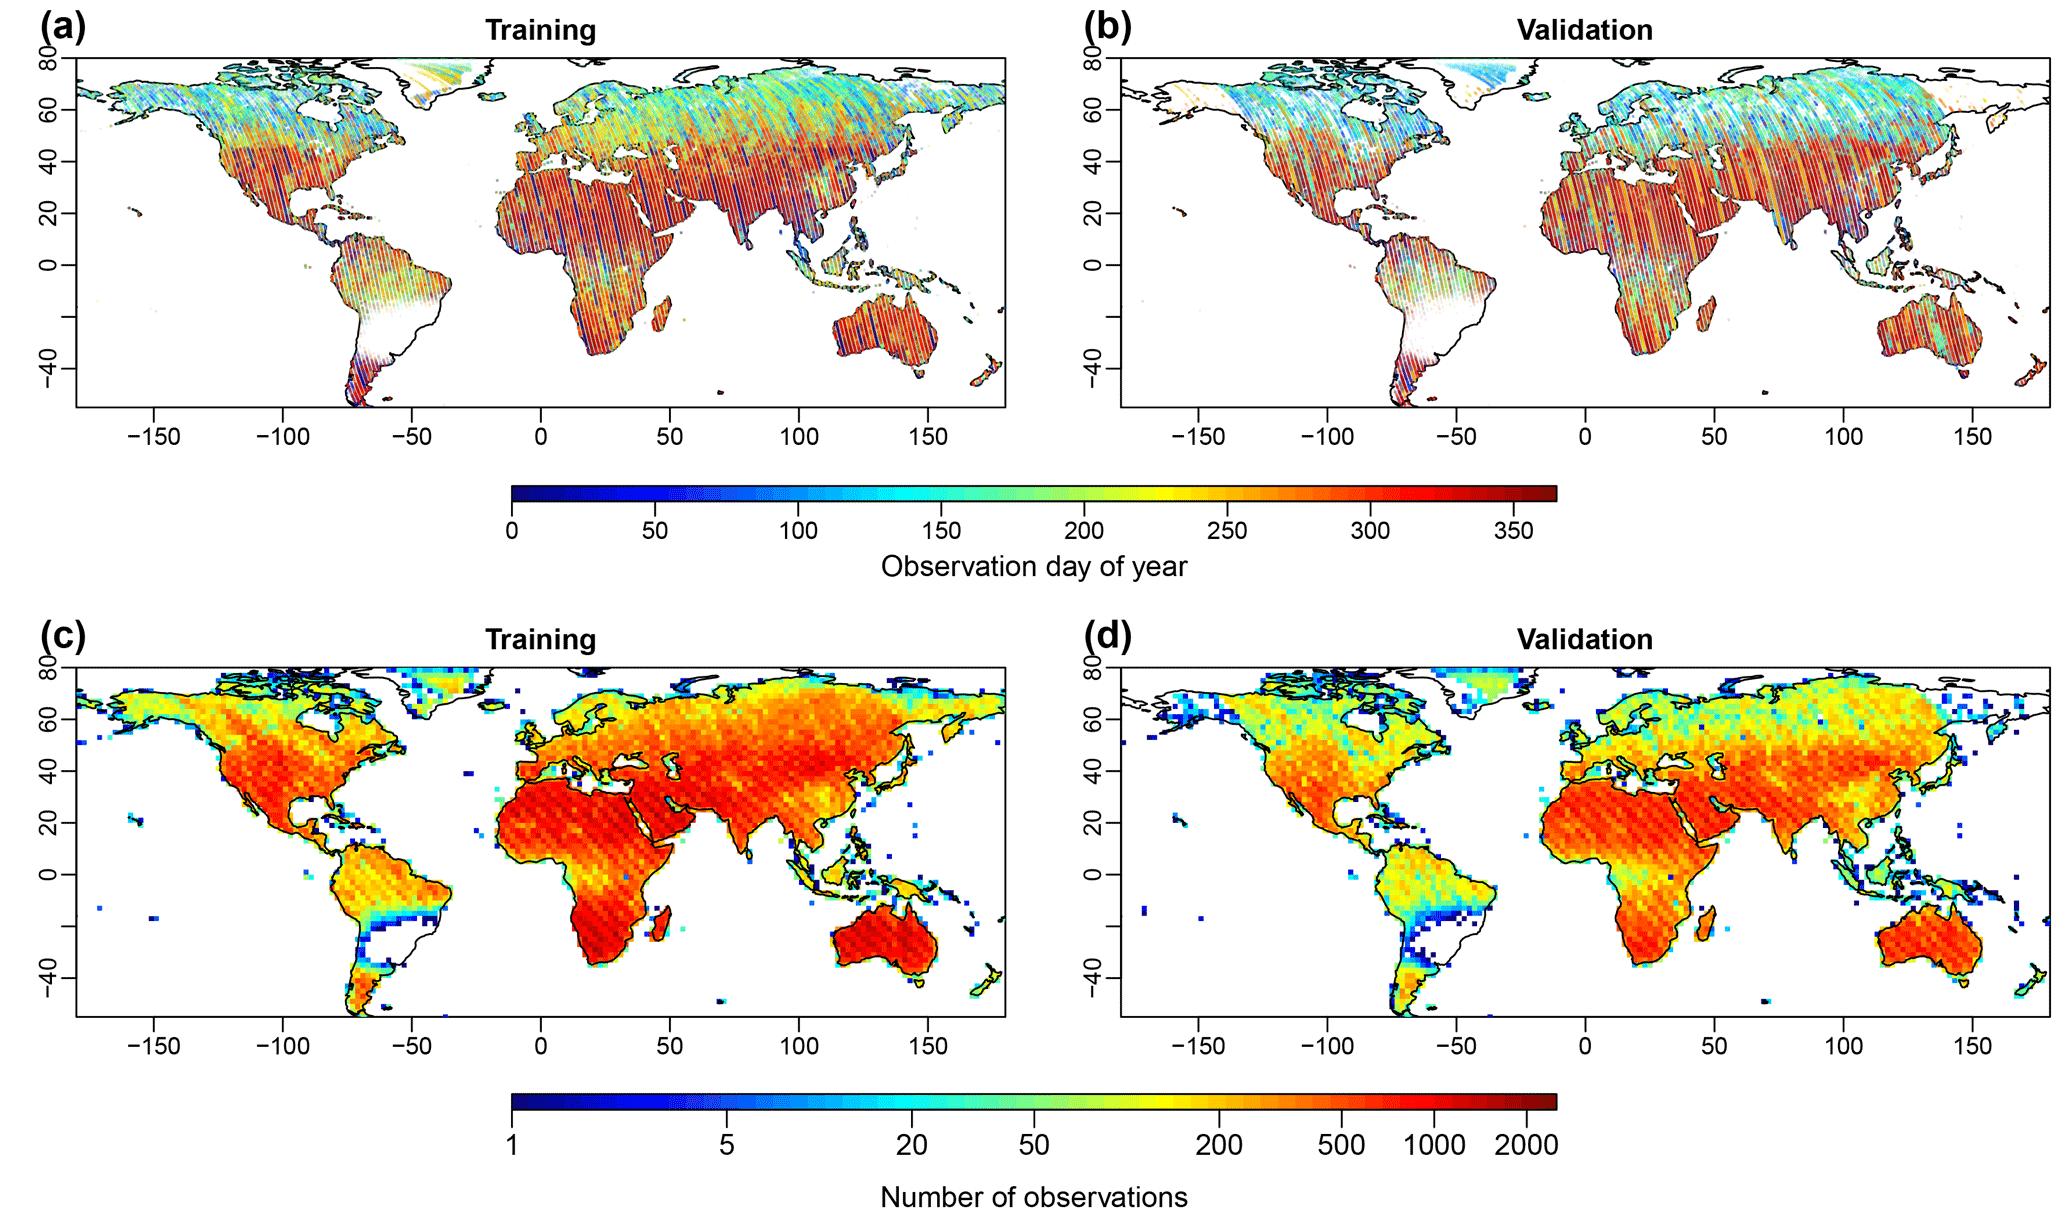 BG - A global spatially contiguous solar-induced